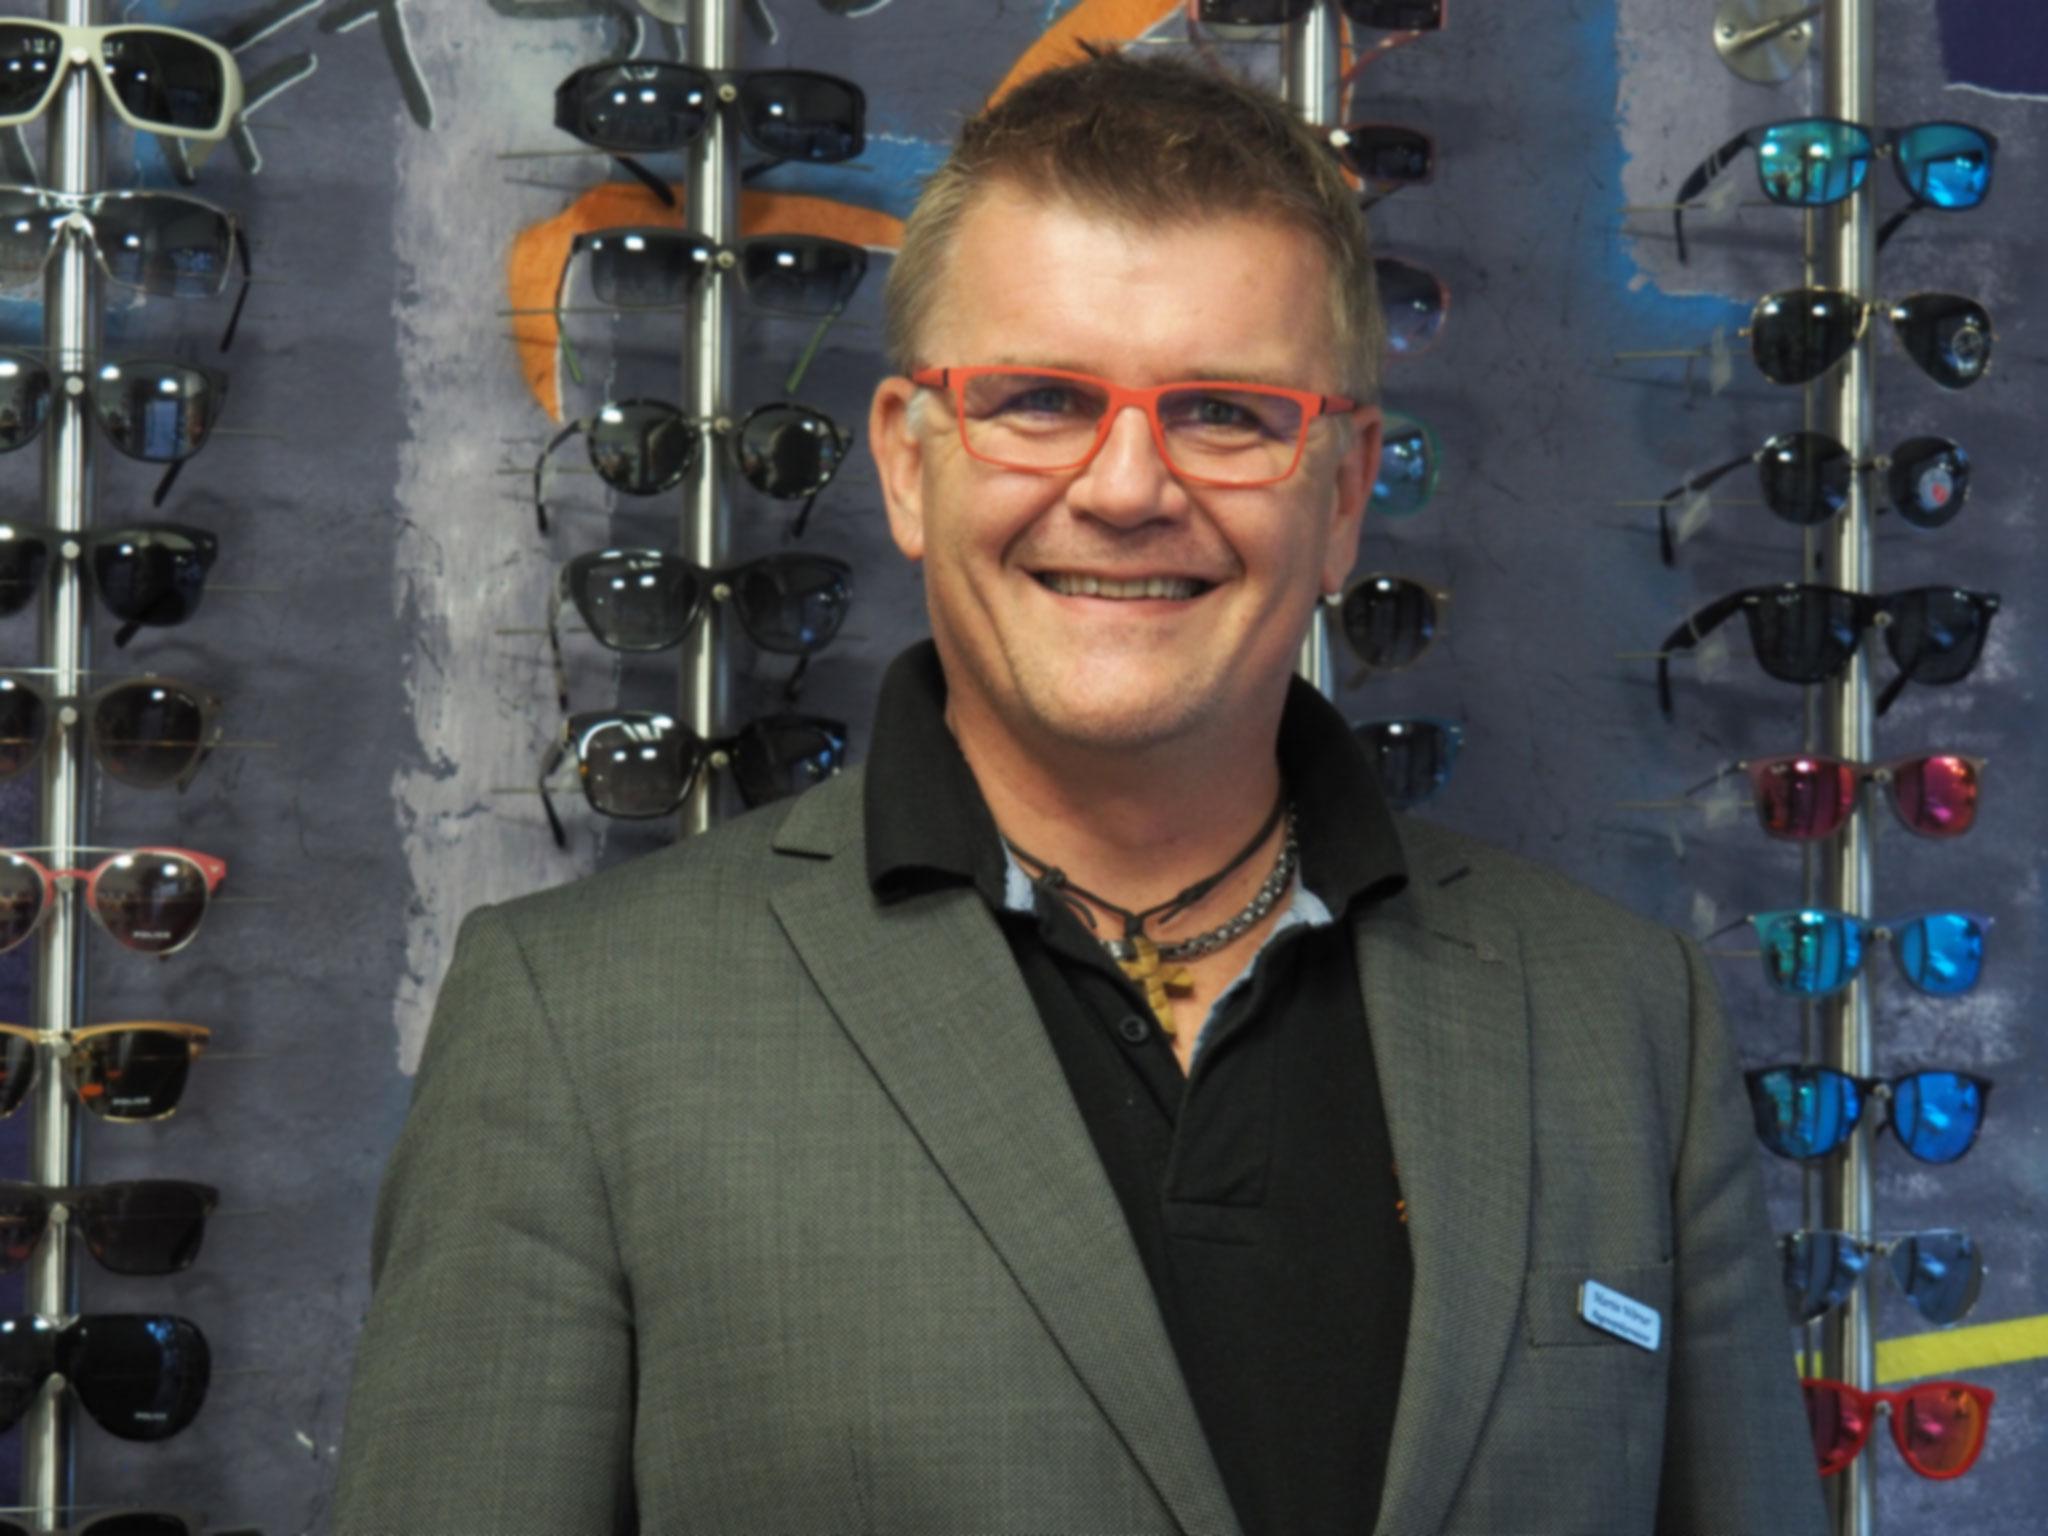 Martin Wörner, Augenoptikermeister